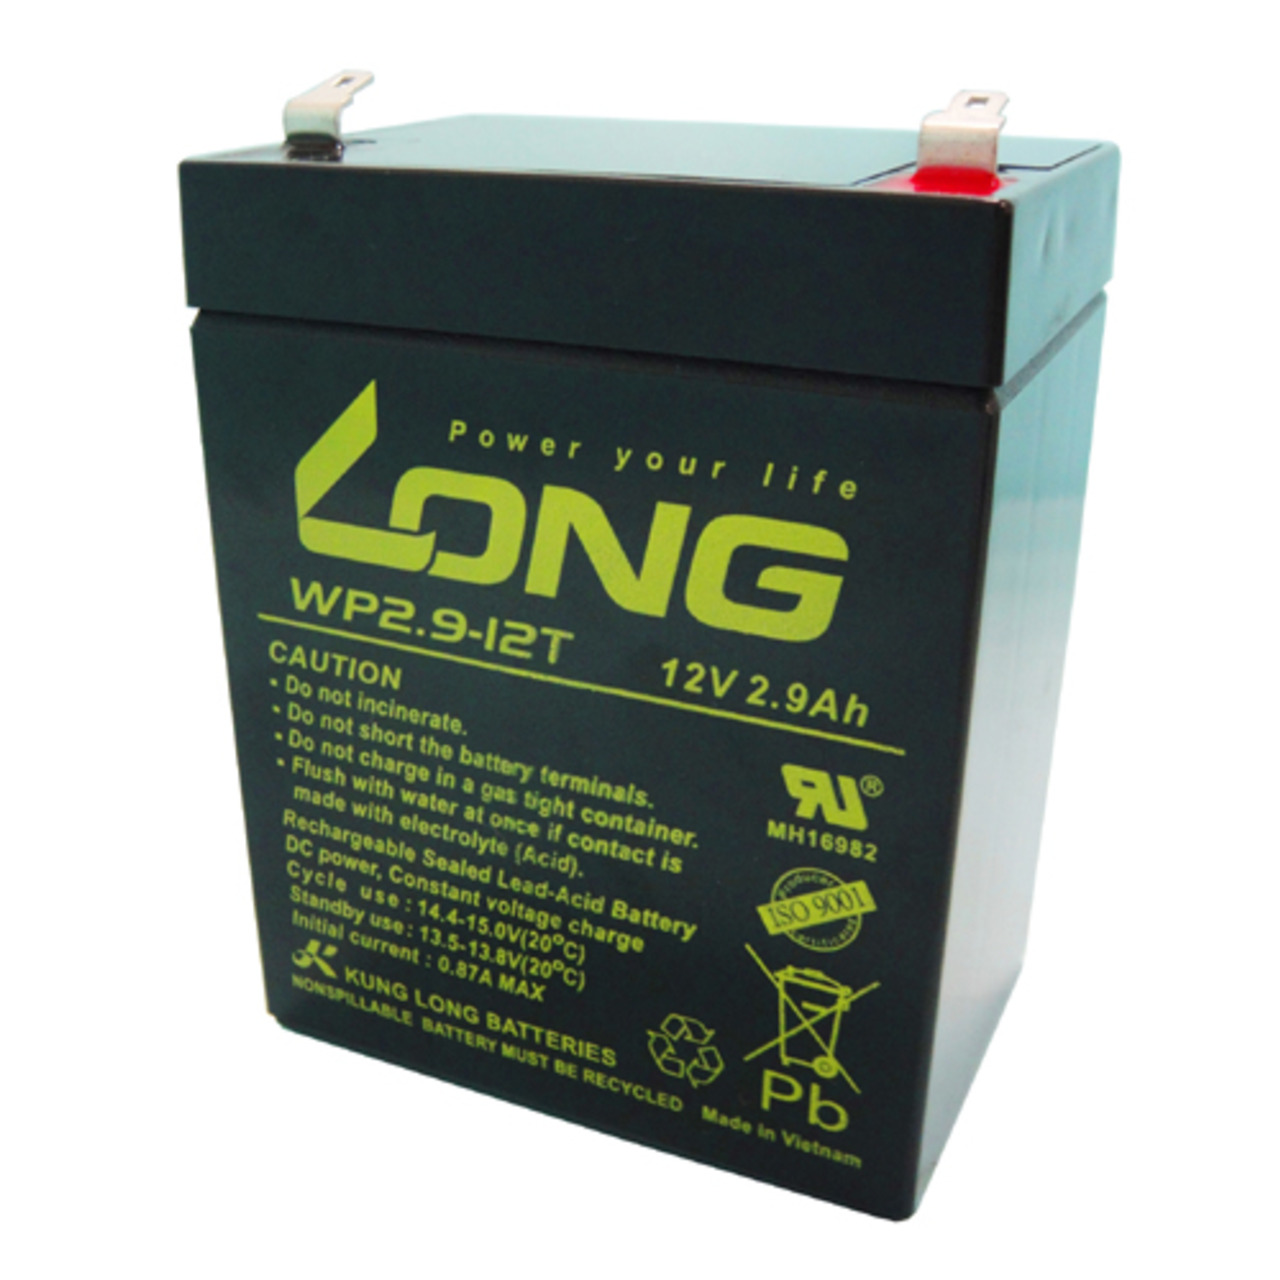 Kung Long Blei-AGM-Akku WP2-9-12T- 12 V- 2-9 Ah